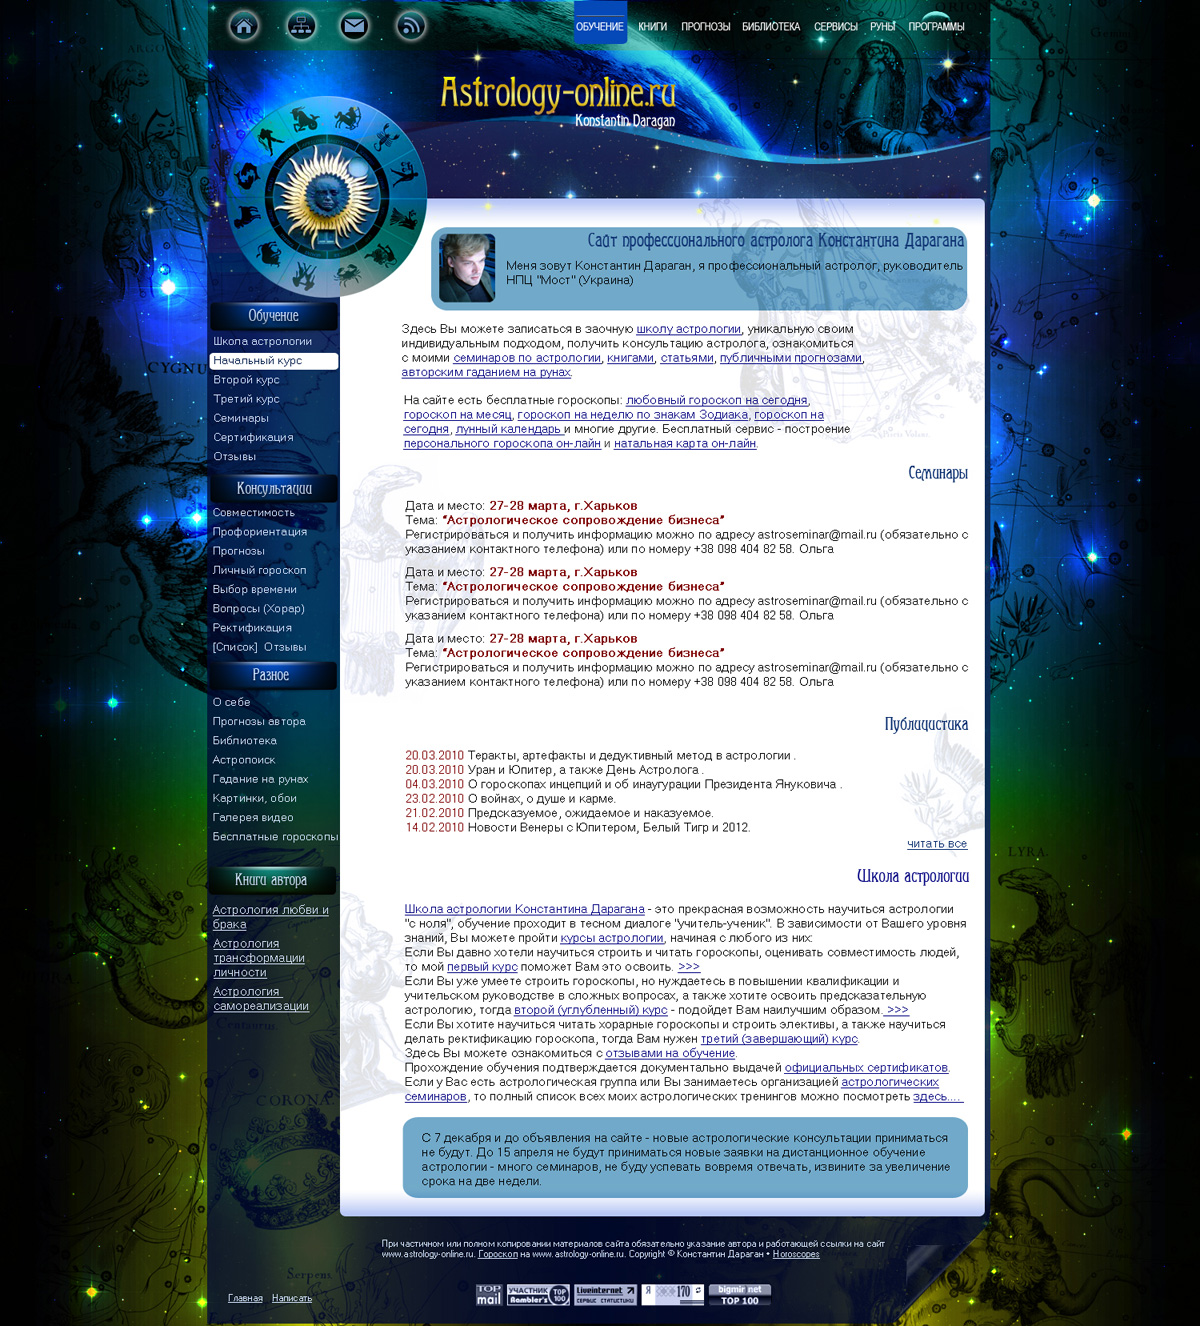 Astrology-online.ru